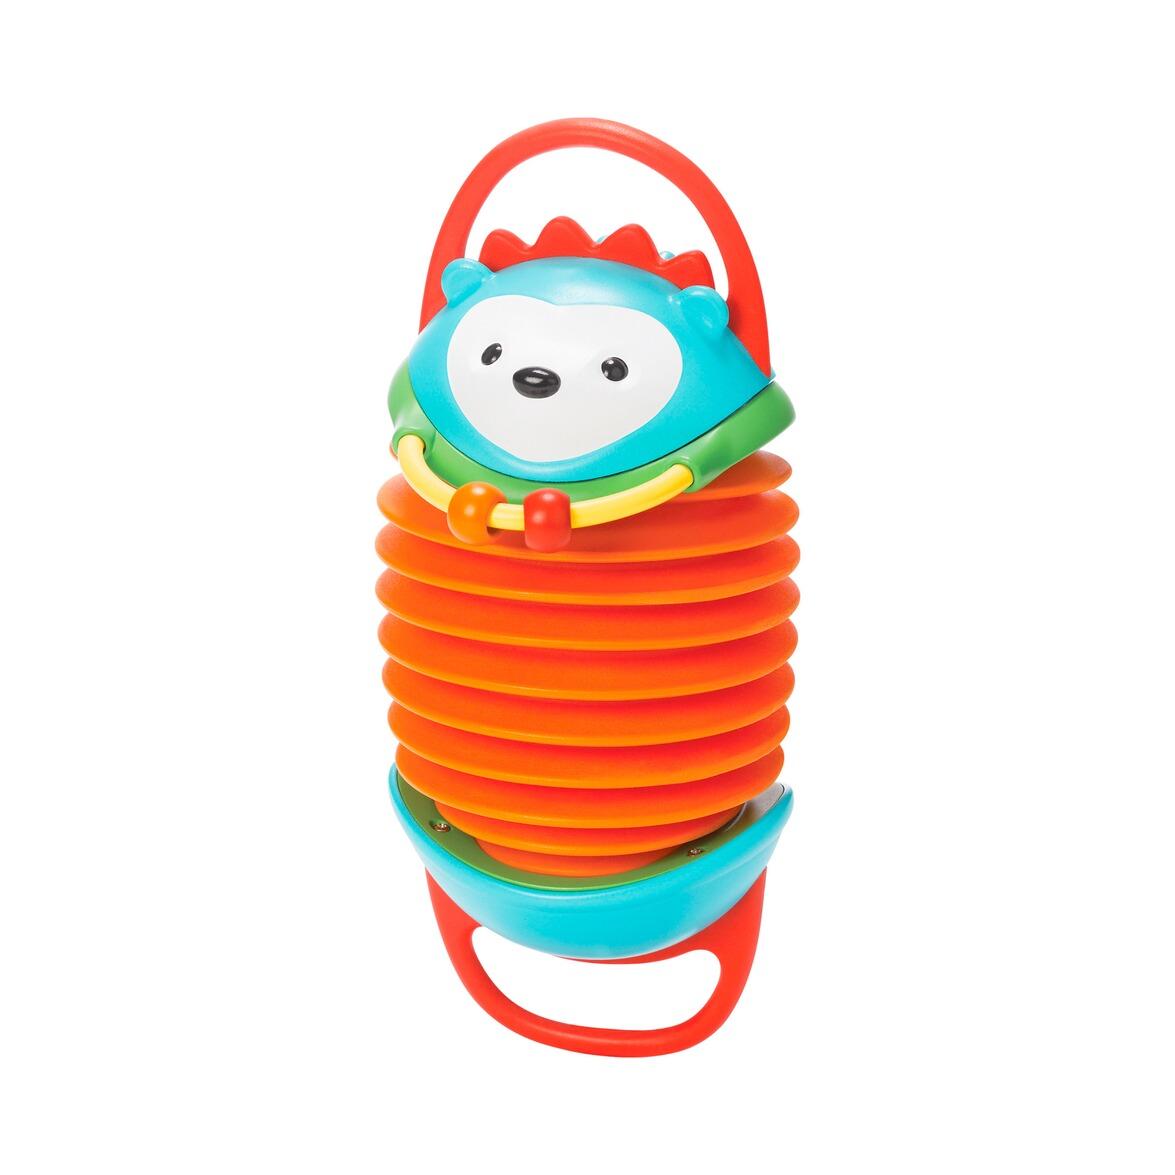 skip hop musikspielzeug igelakkordeon online kaufen